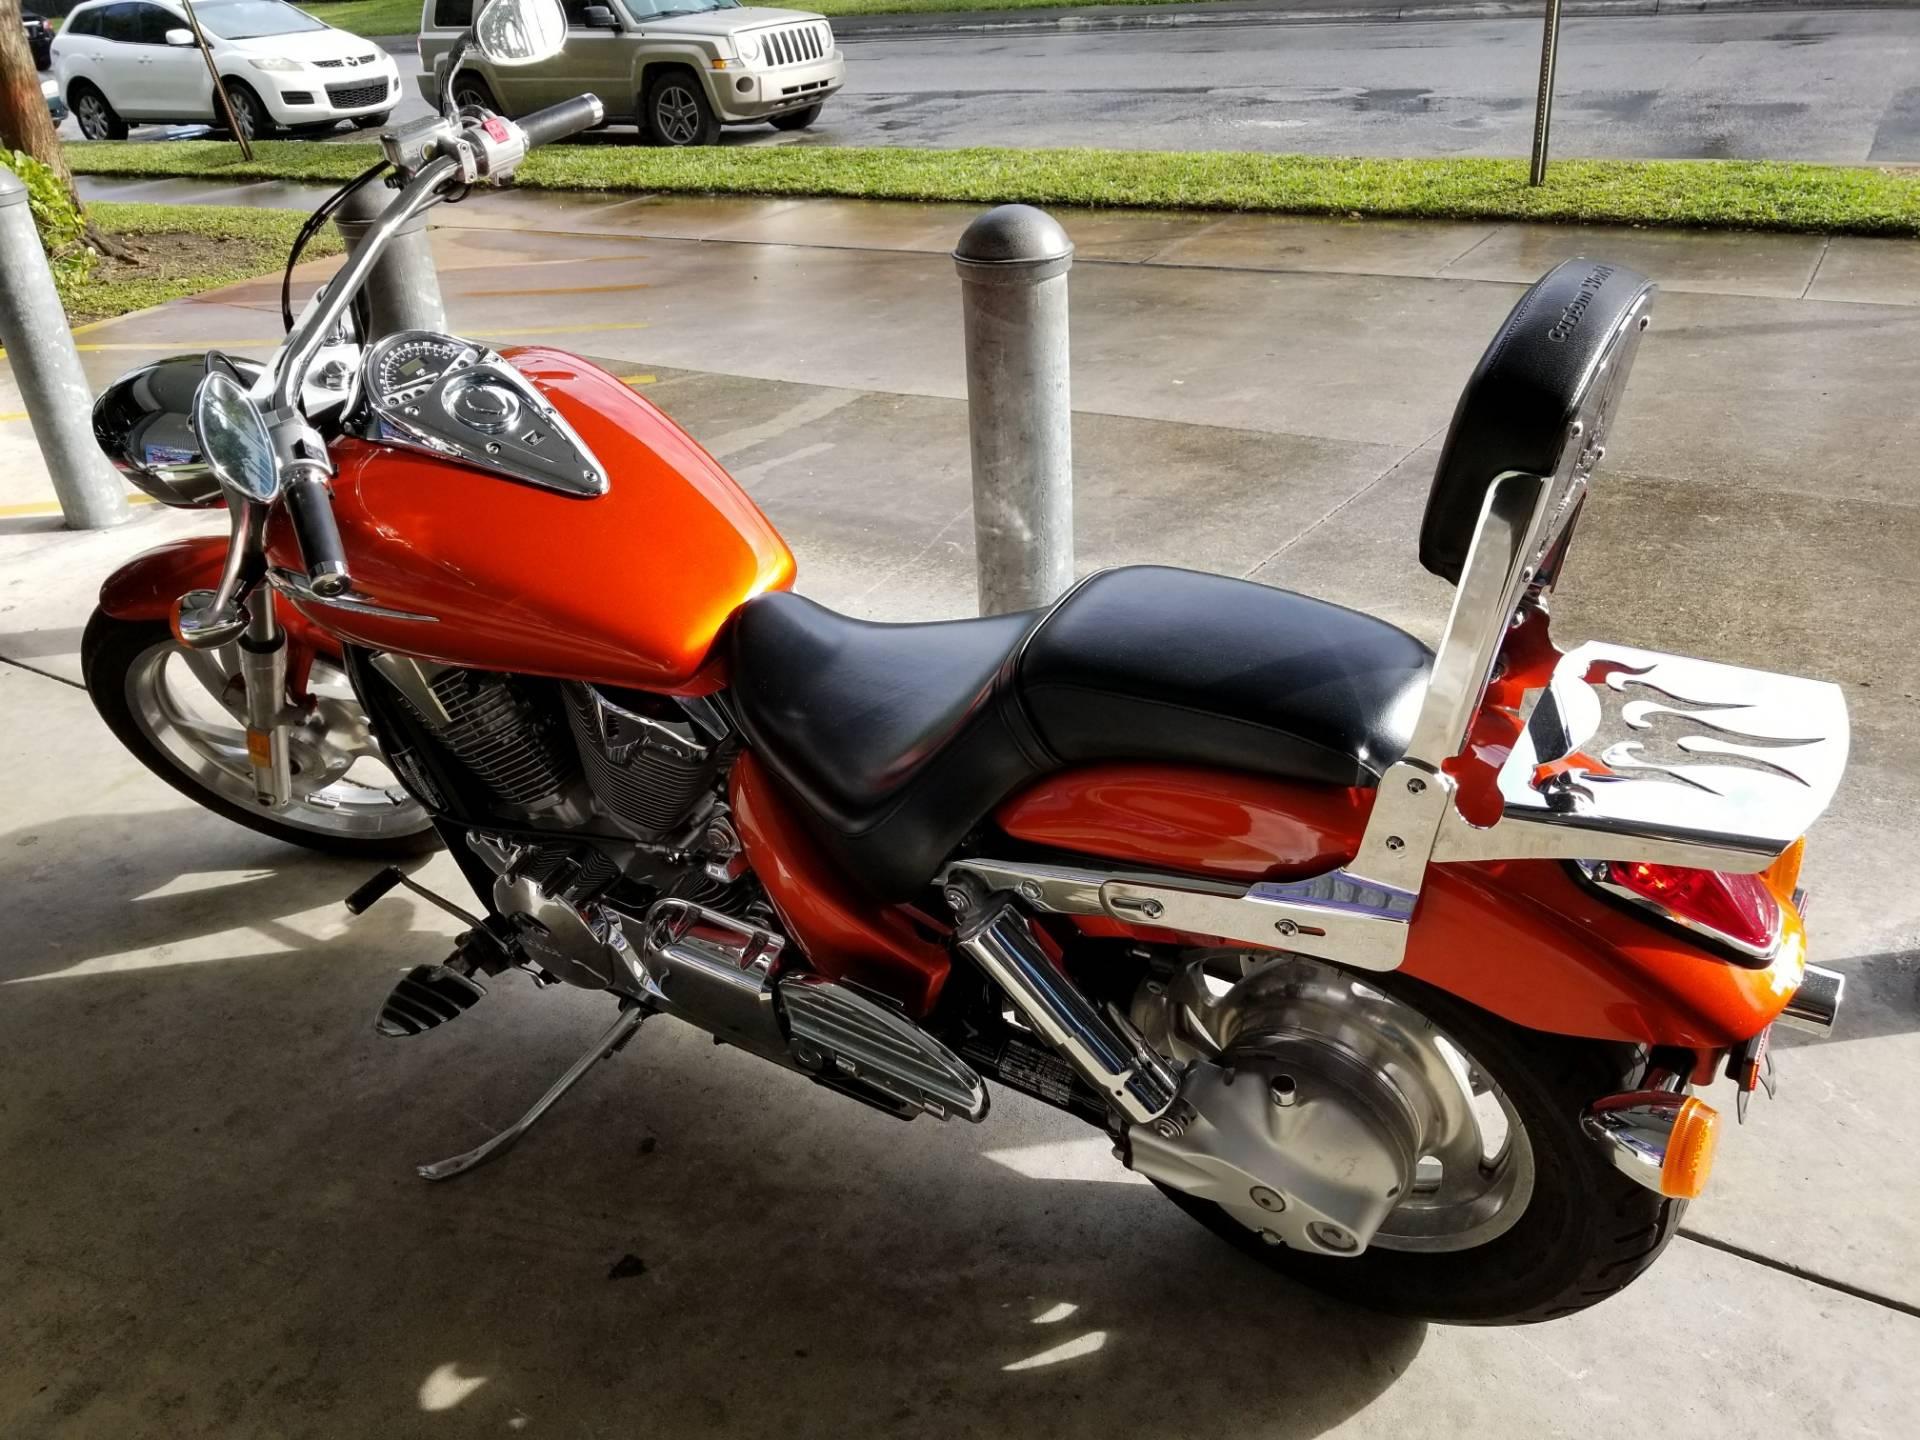 Used 2006 honda vtx 1300c motorcycles in hialeah fl for Honda florida ave